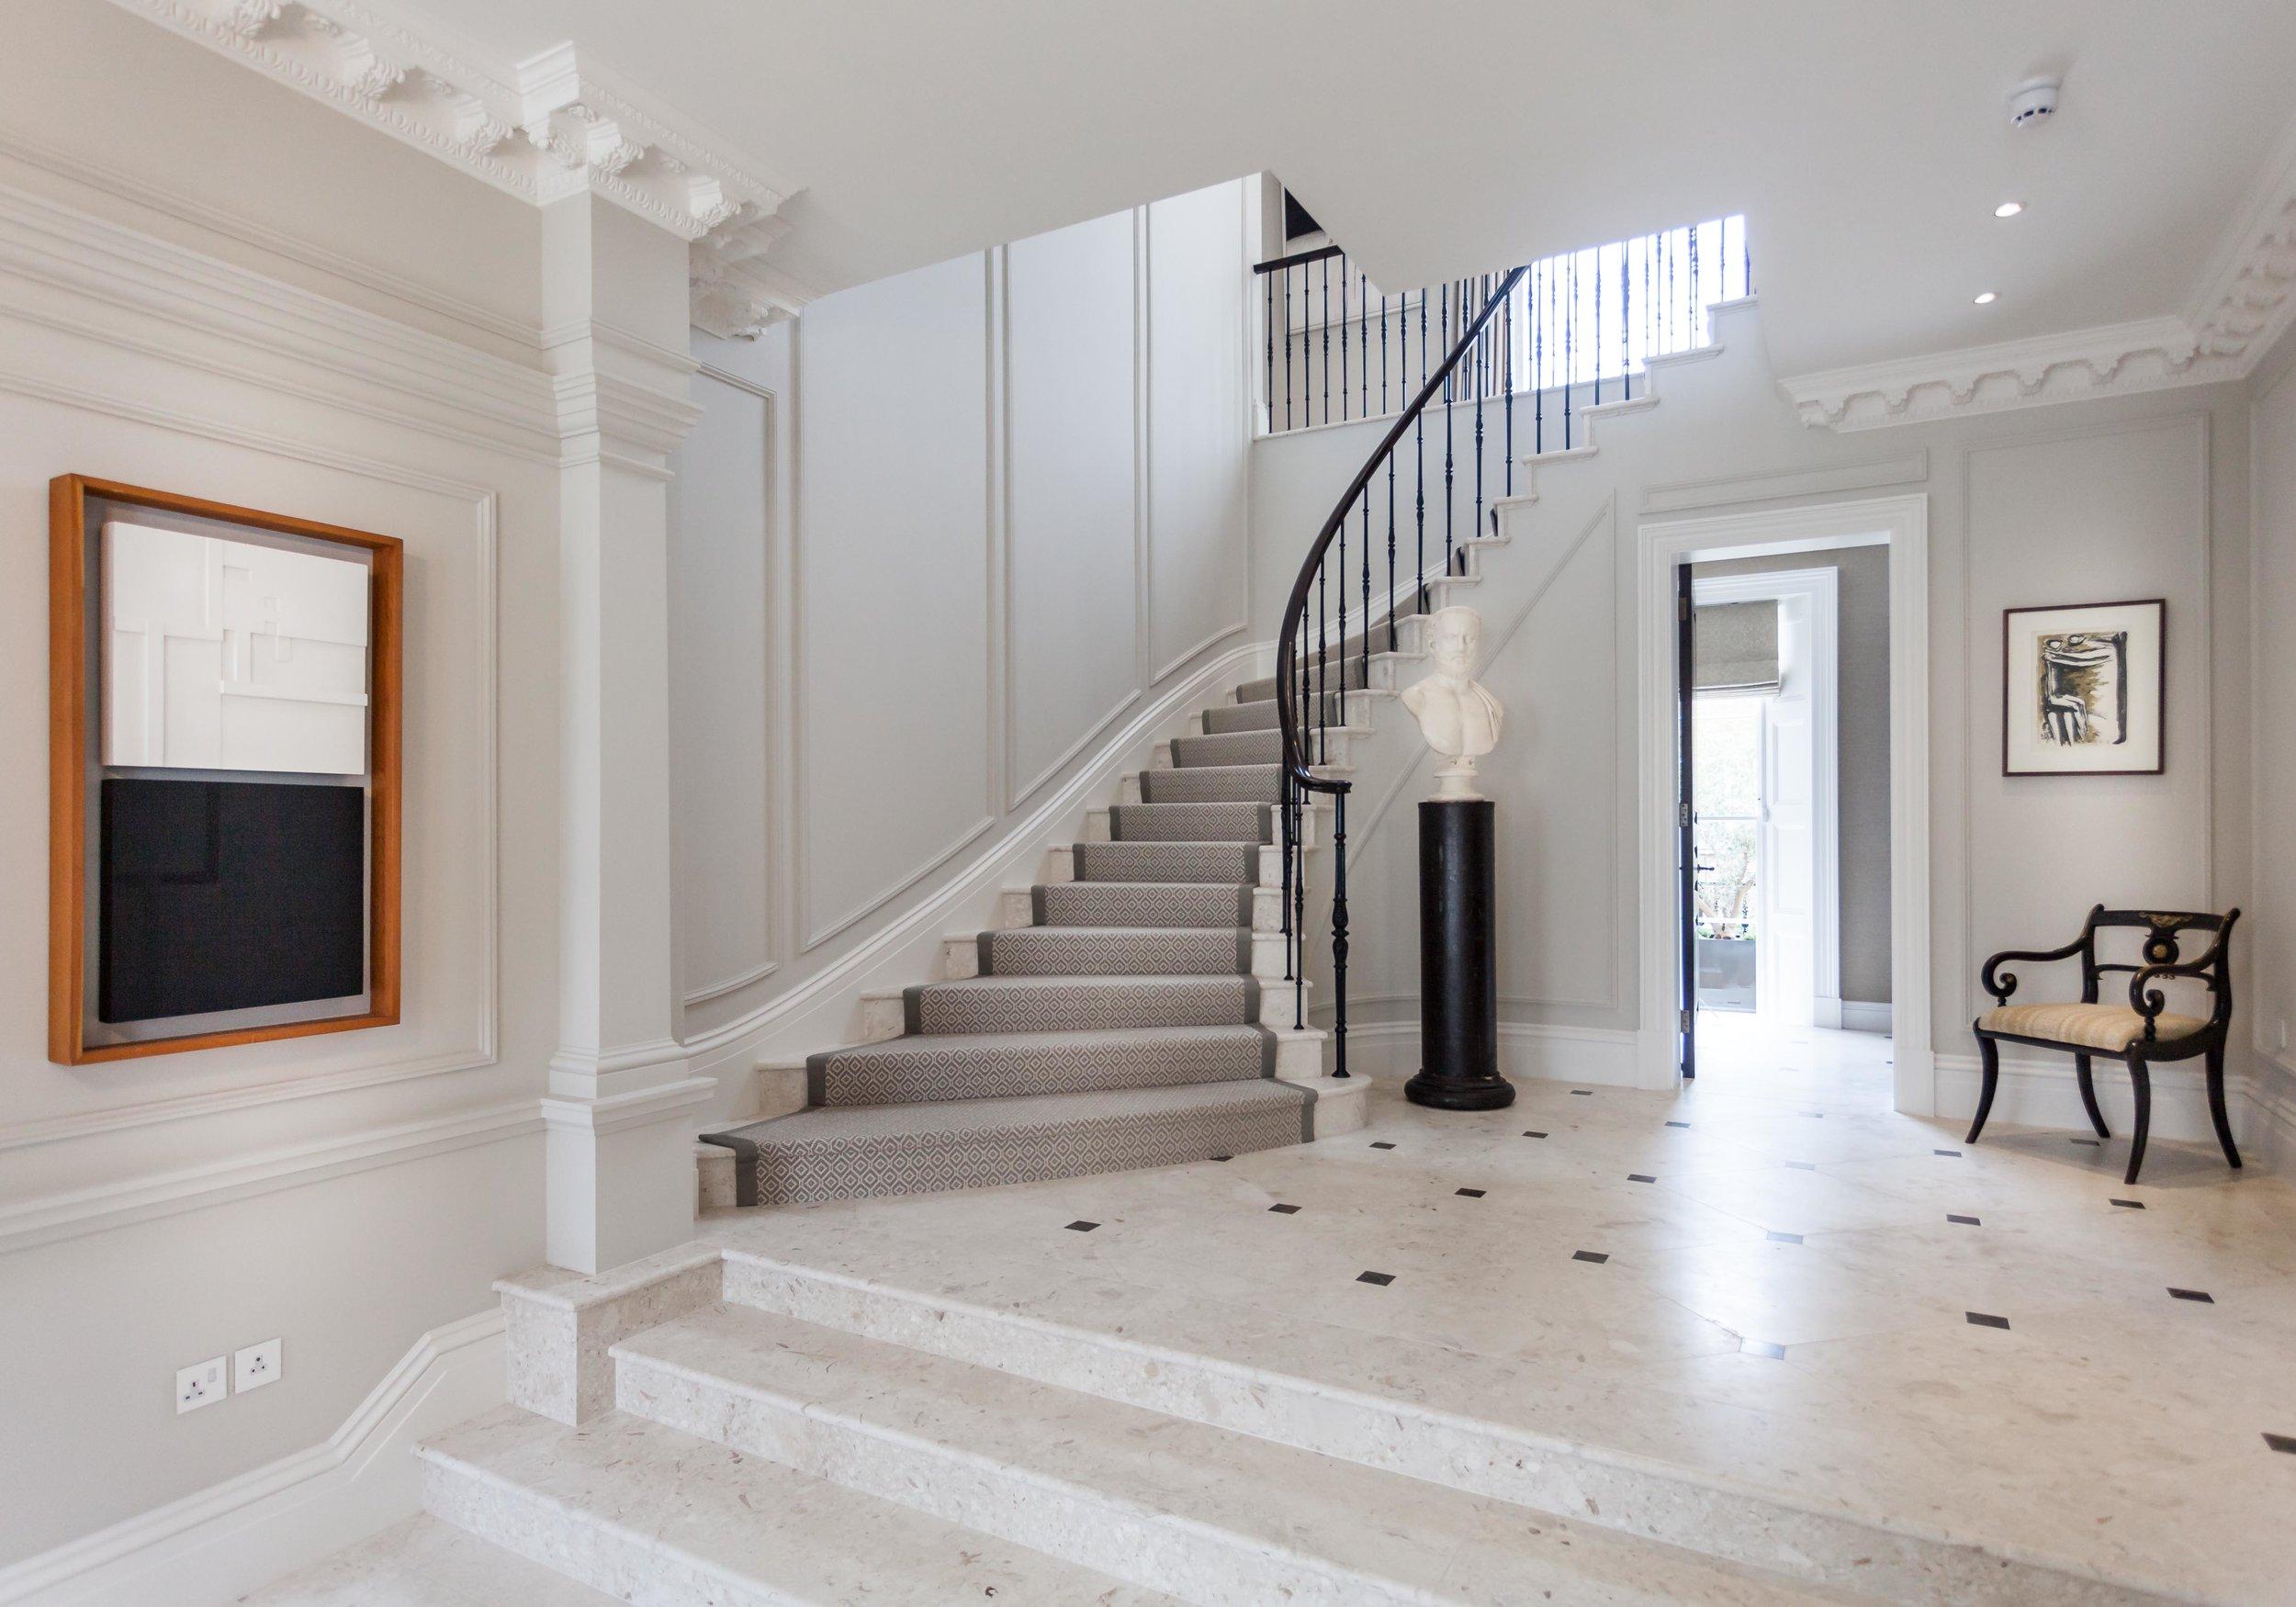 Regents House